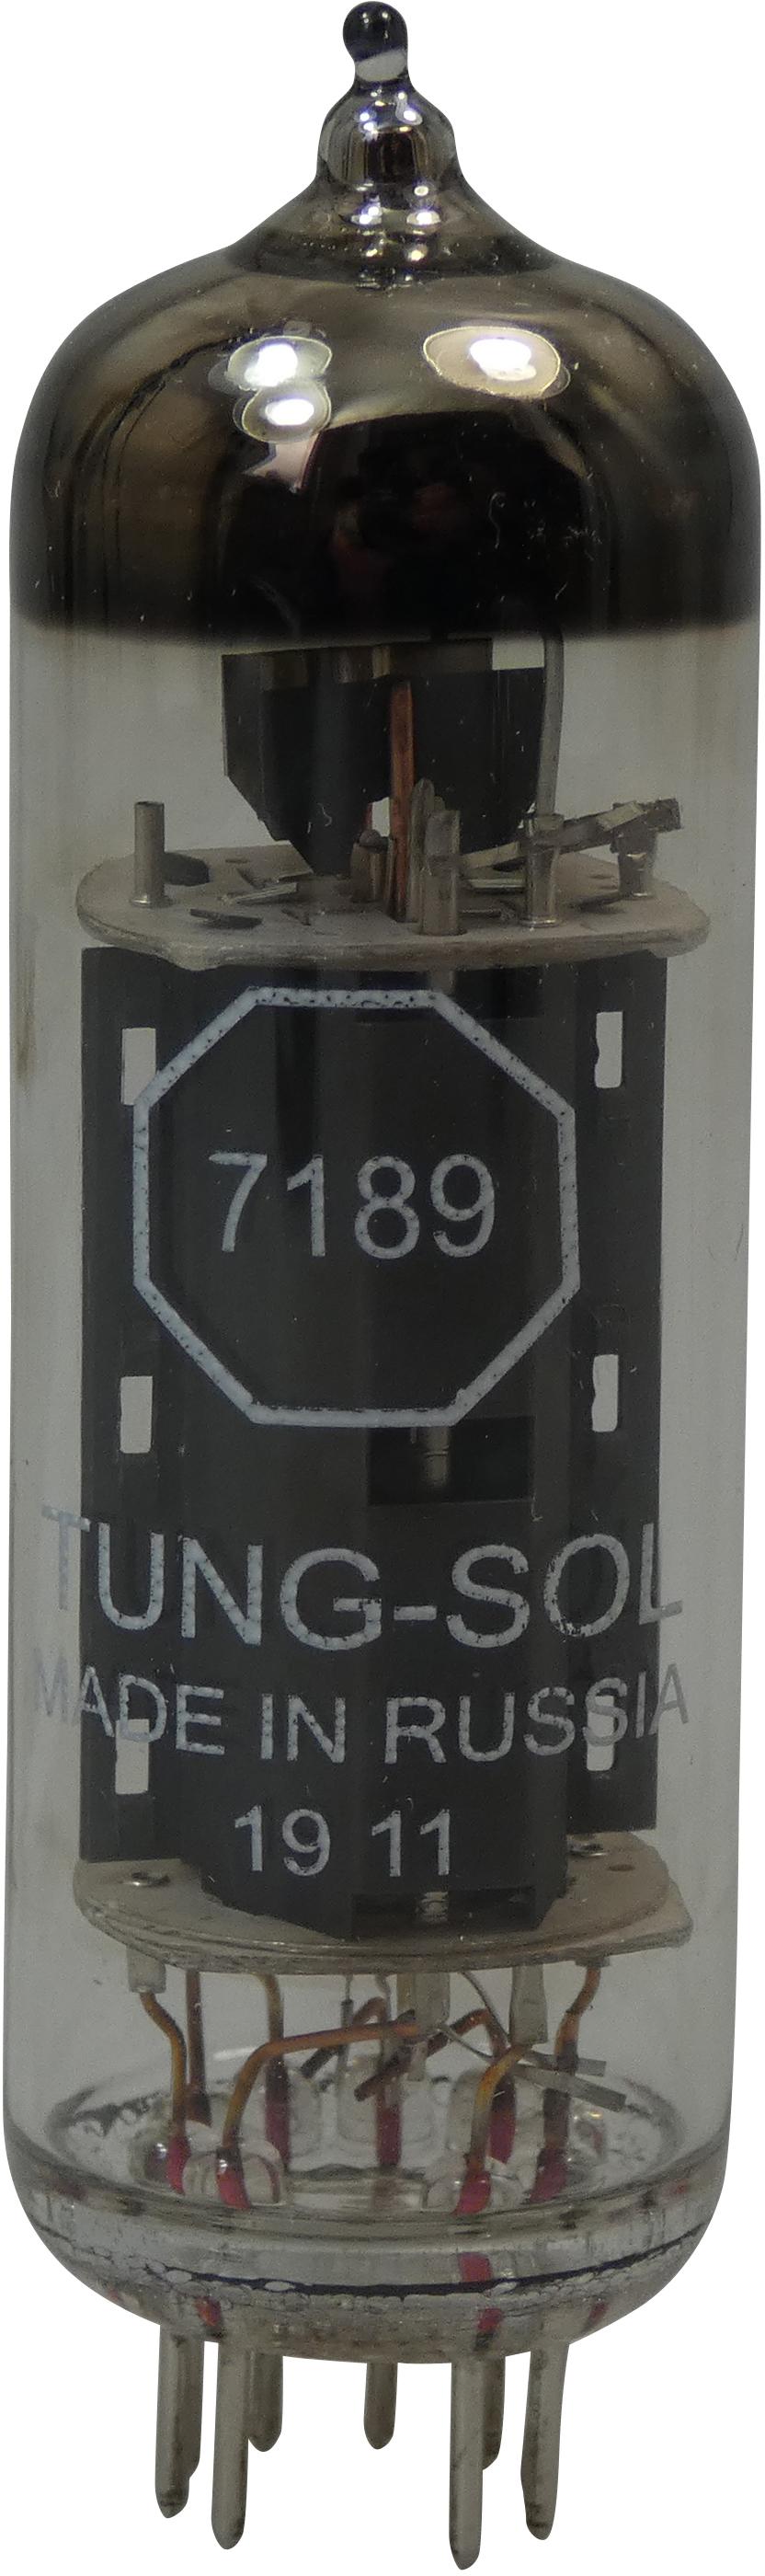 7189 TungSol Matched & Balanced